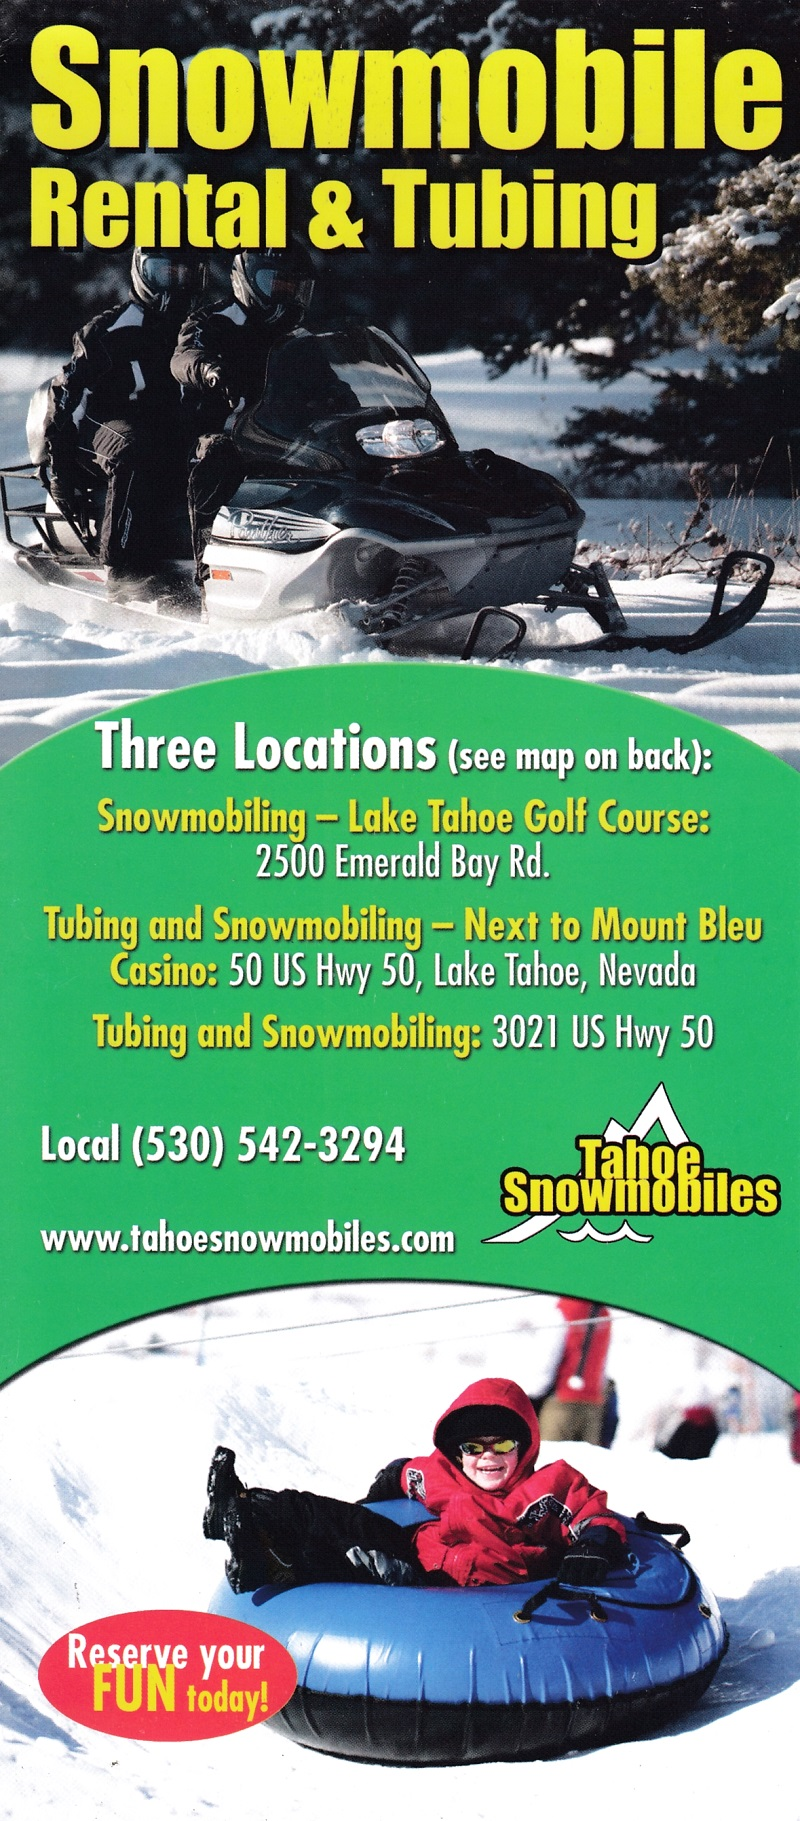 Tahoe Snowmobiles & Tubing